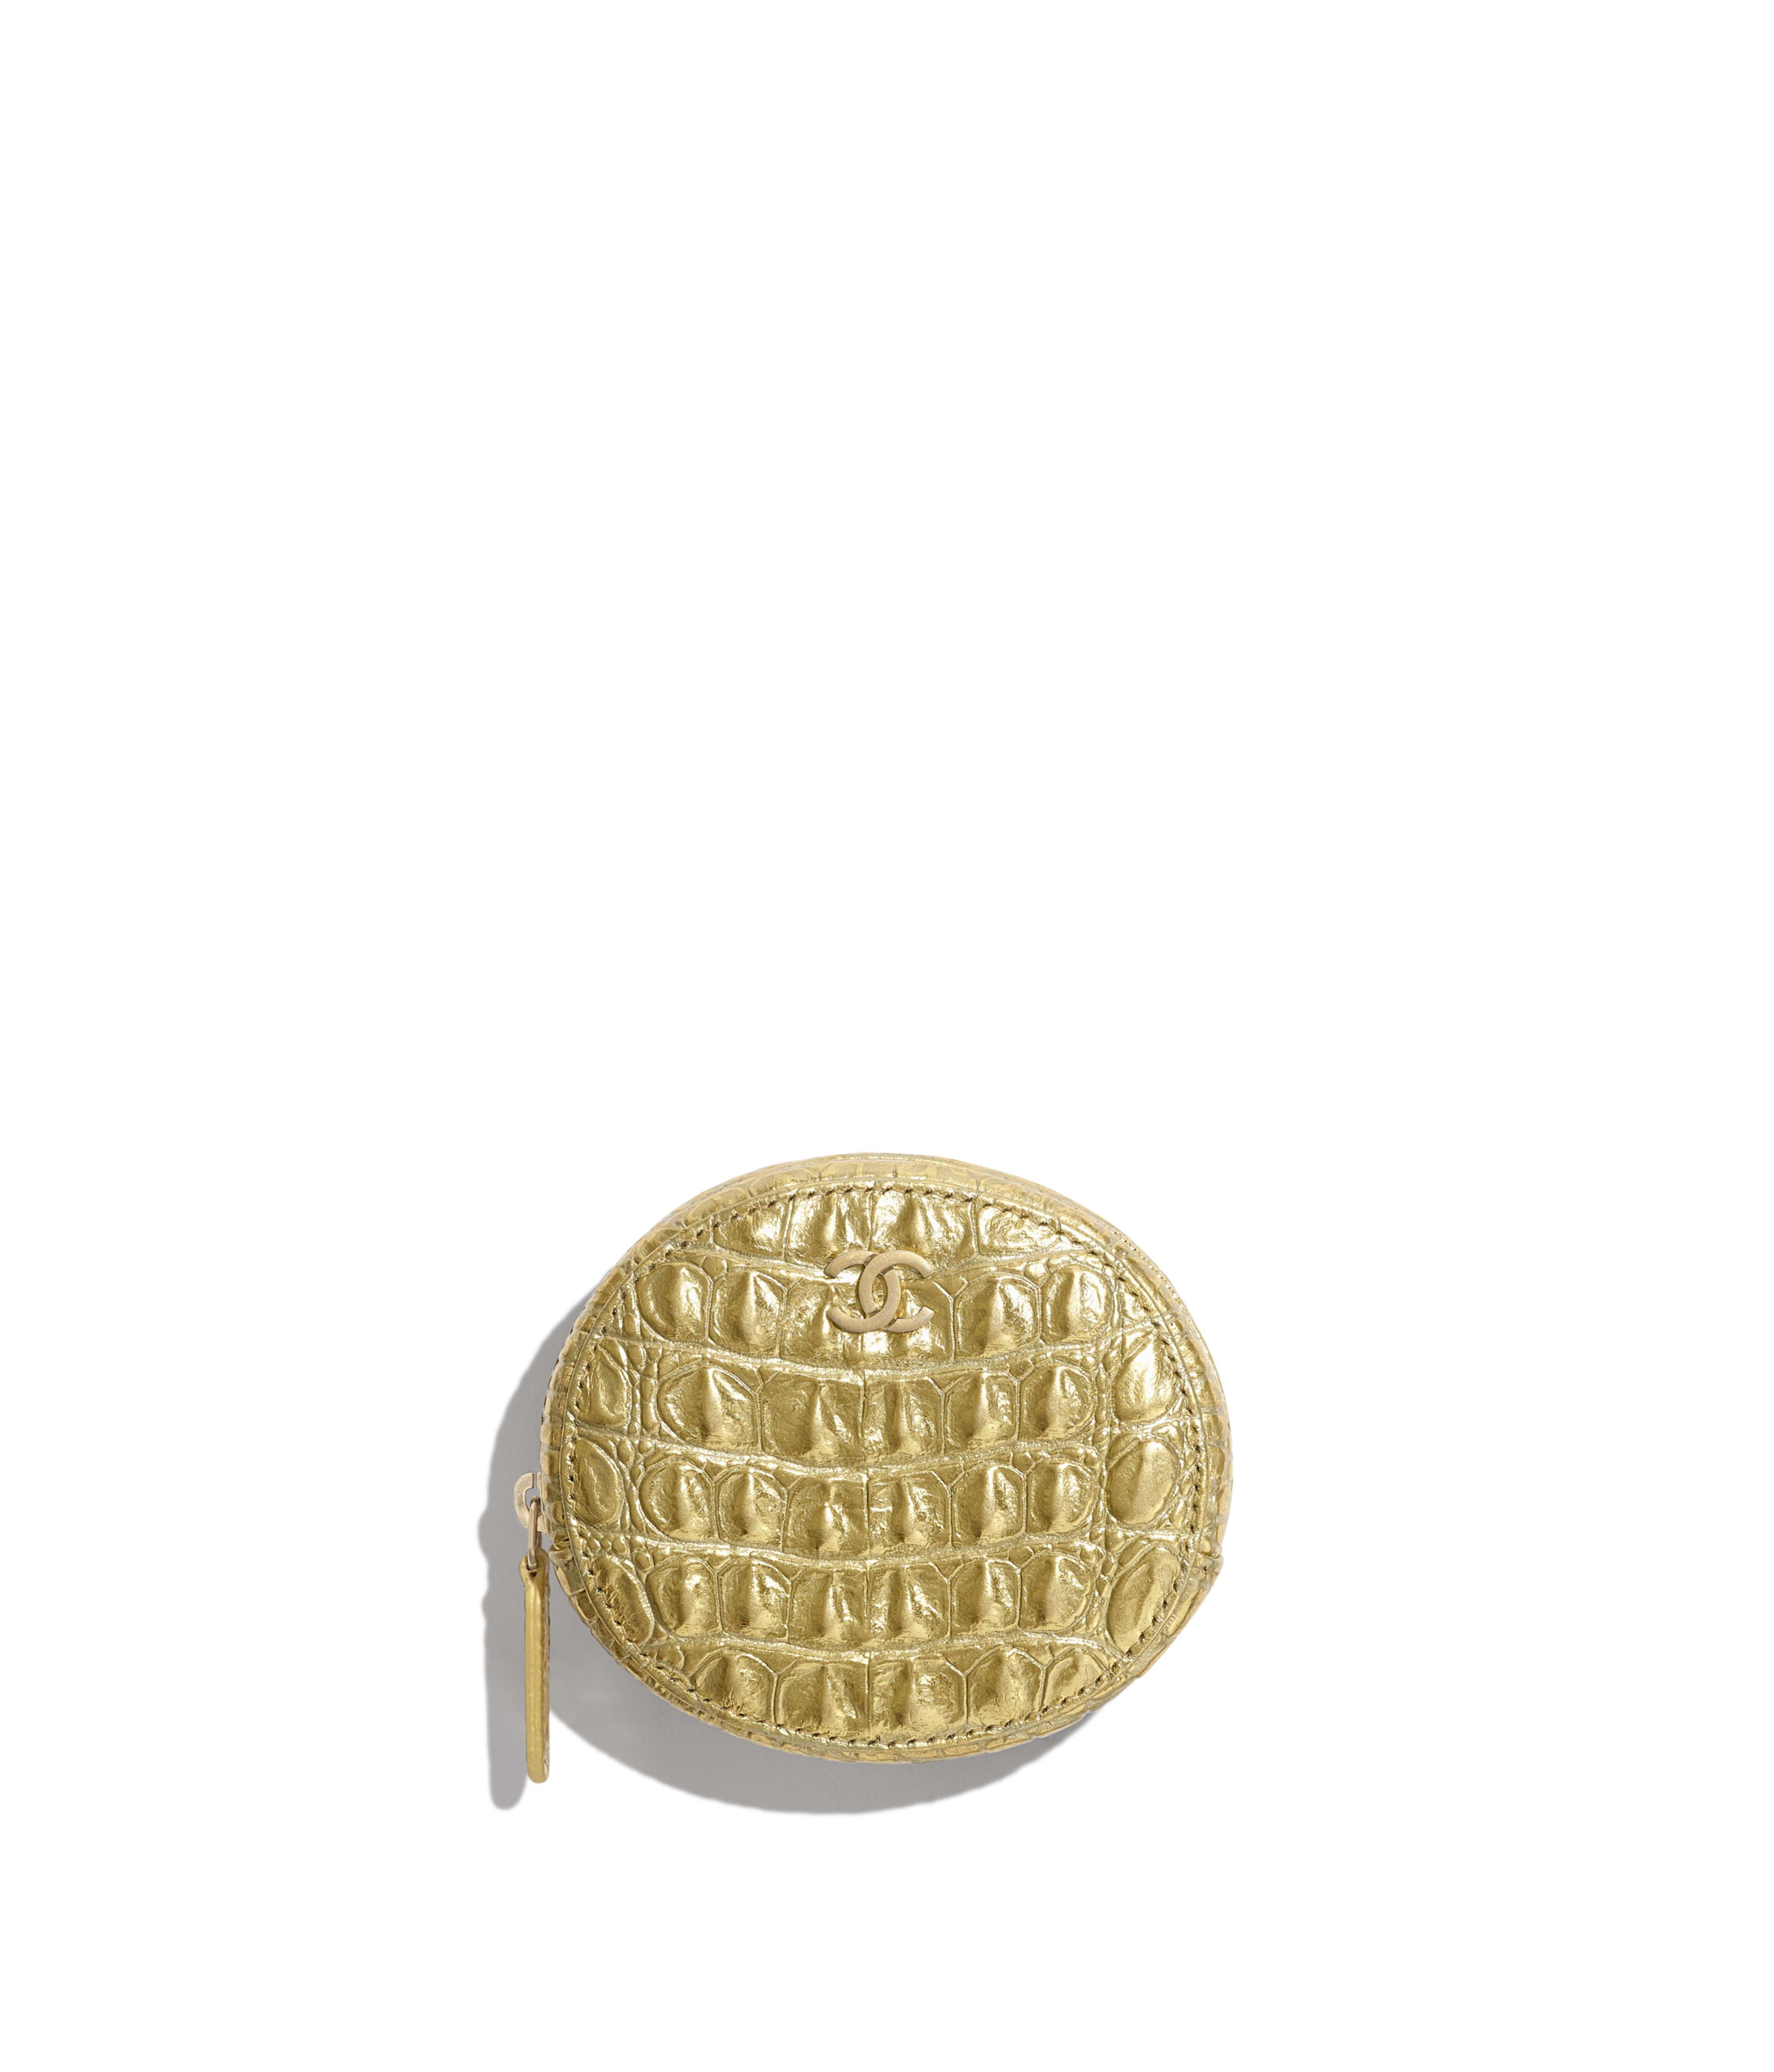 22581aeddfe6 Classic Zipped Coin Purse Metallic Crocodile Embossed Calfskin & Gold  Metal, Gold Ref. A68995B00798N4752